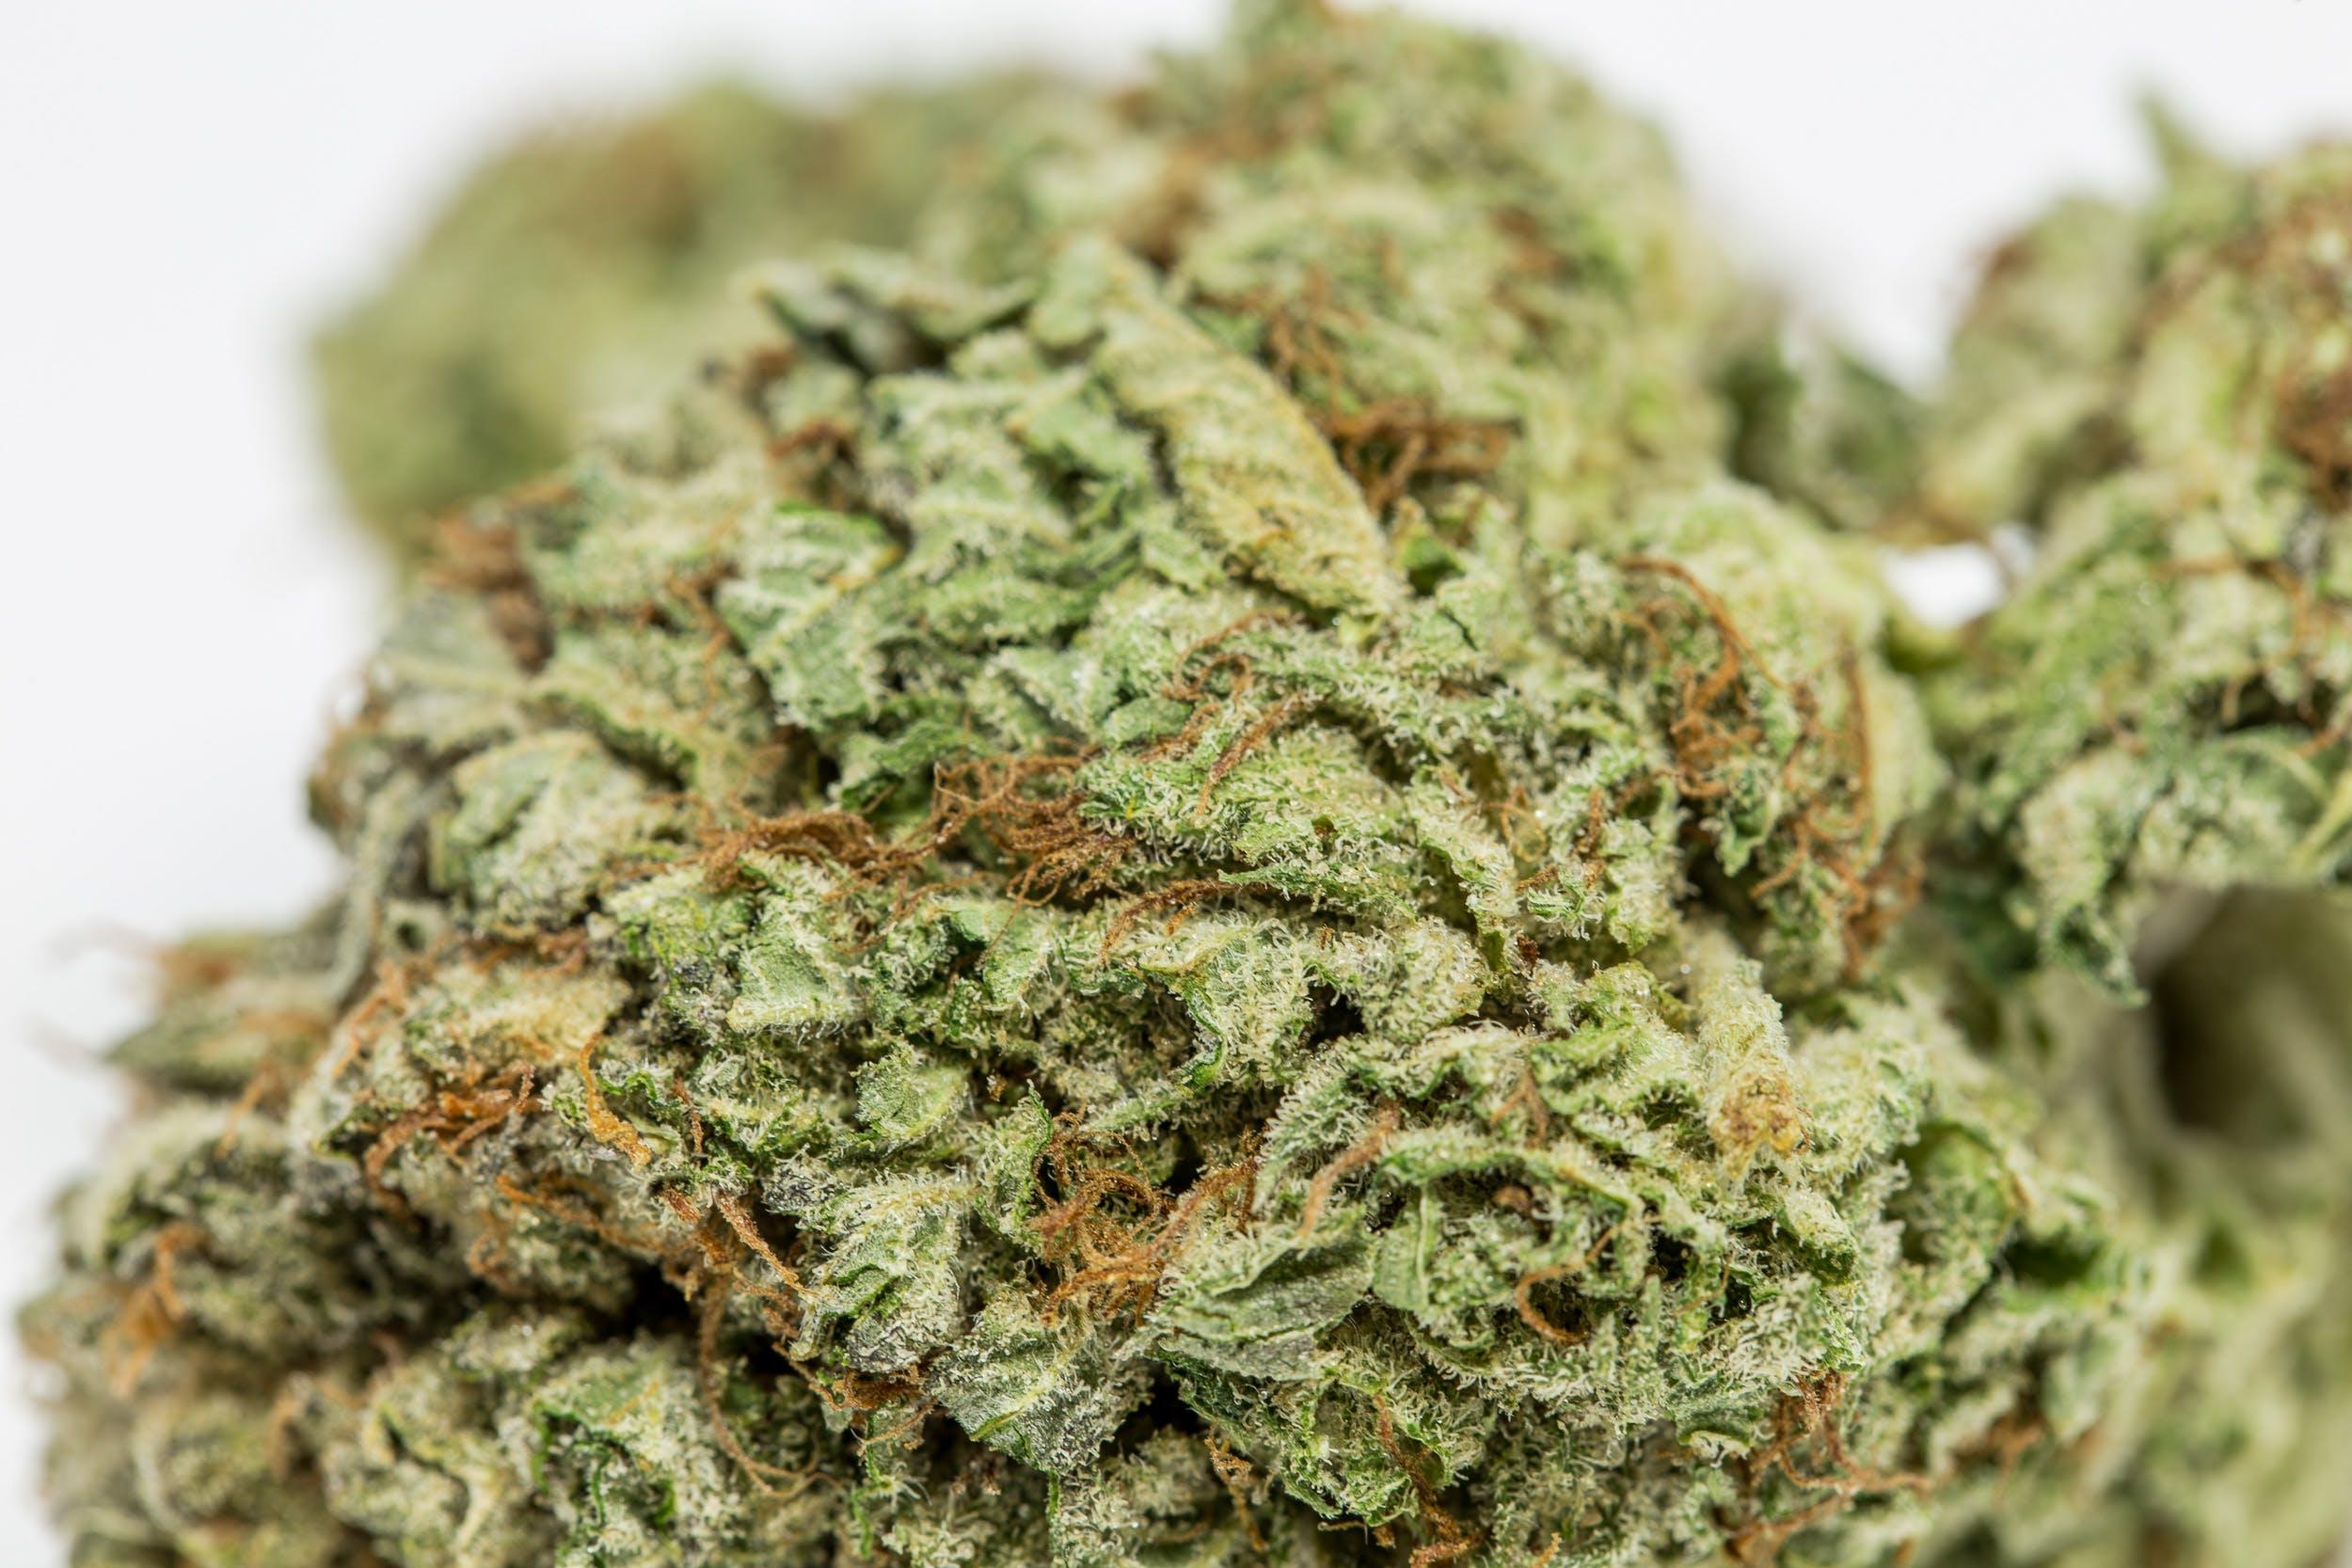 Abusive OG Weed; Abusive OG Cannabis Strain; Abusive OG Indica Marijuana Strain